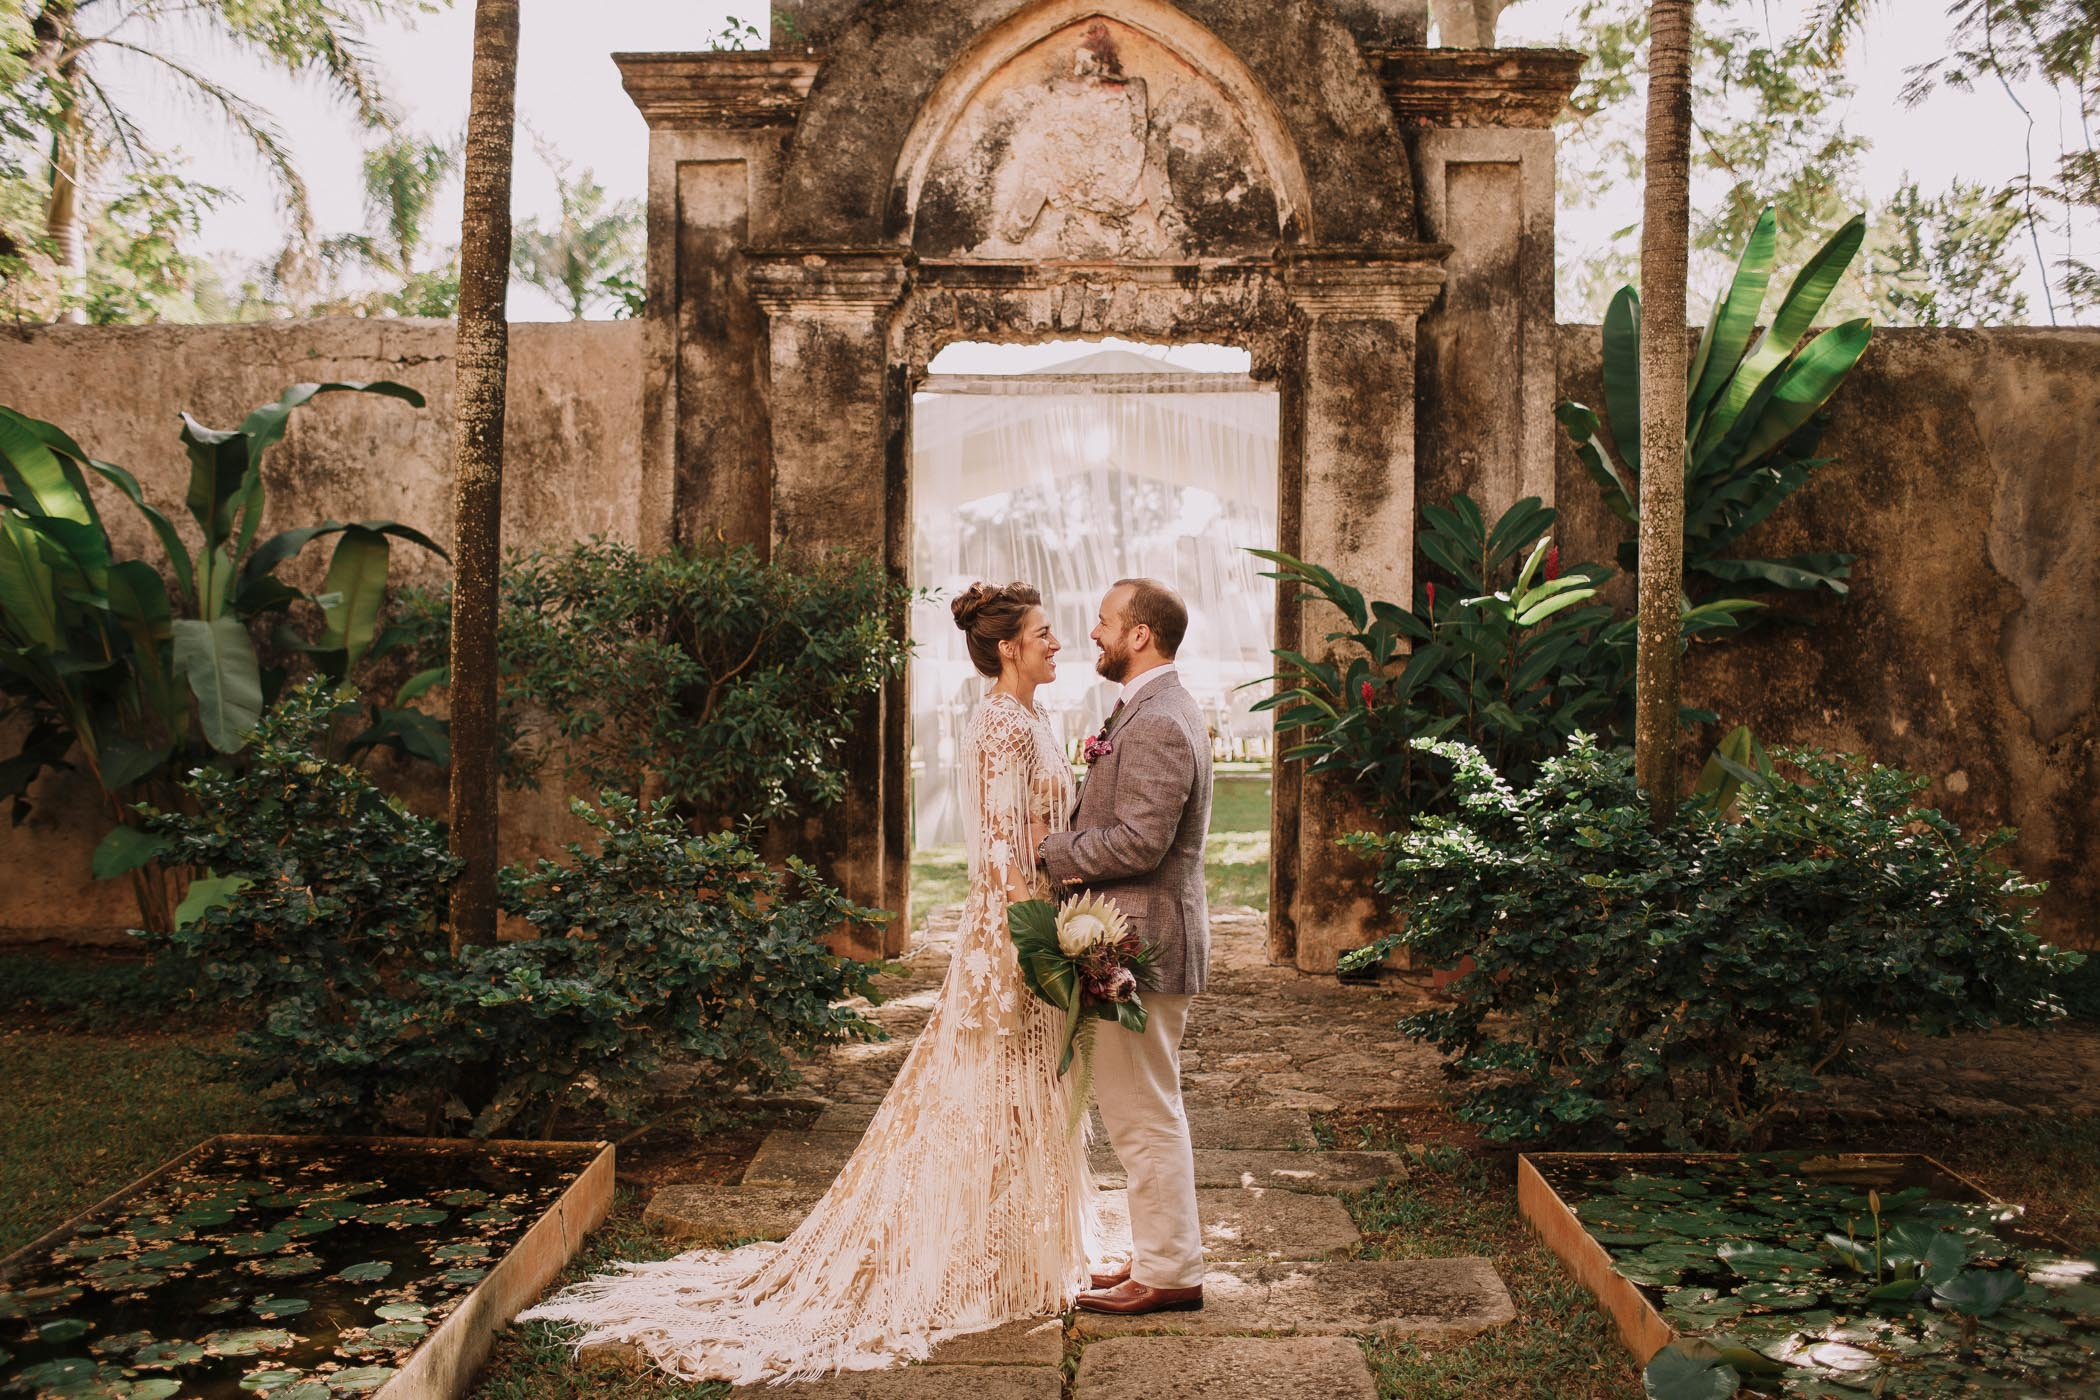 Photographe-mariage-bordeaux-jeremy-boyer-2.jpg